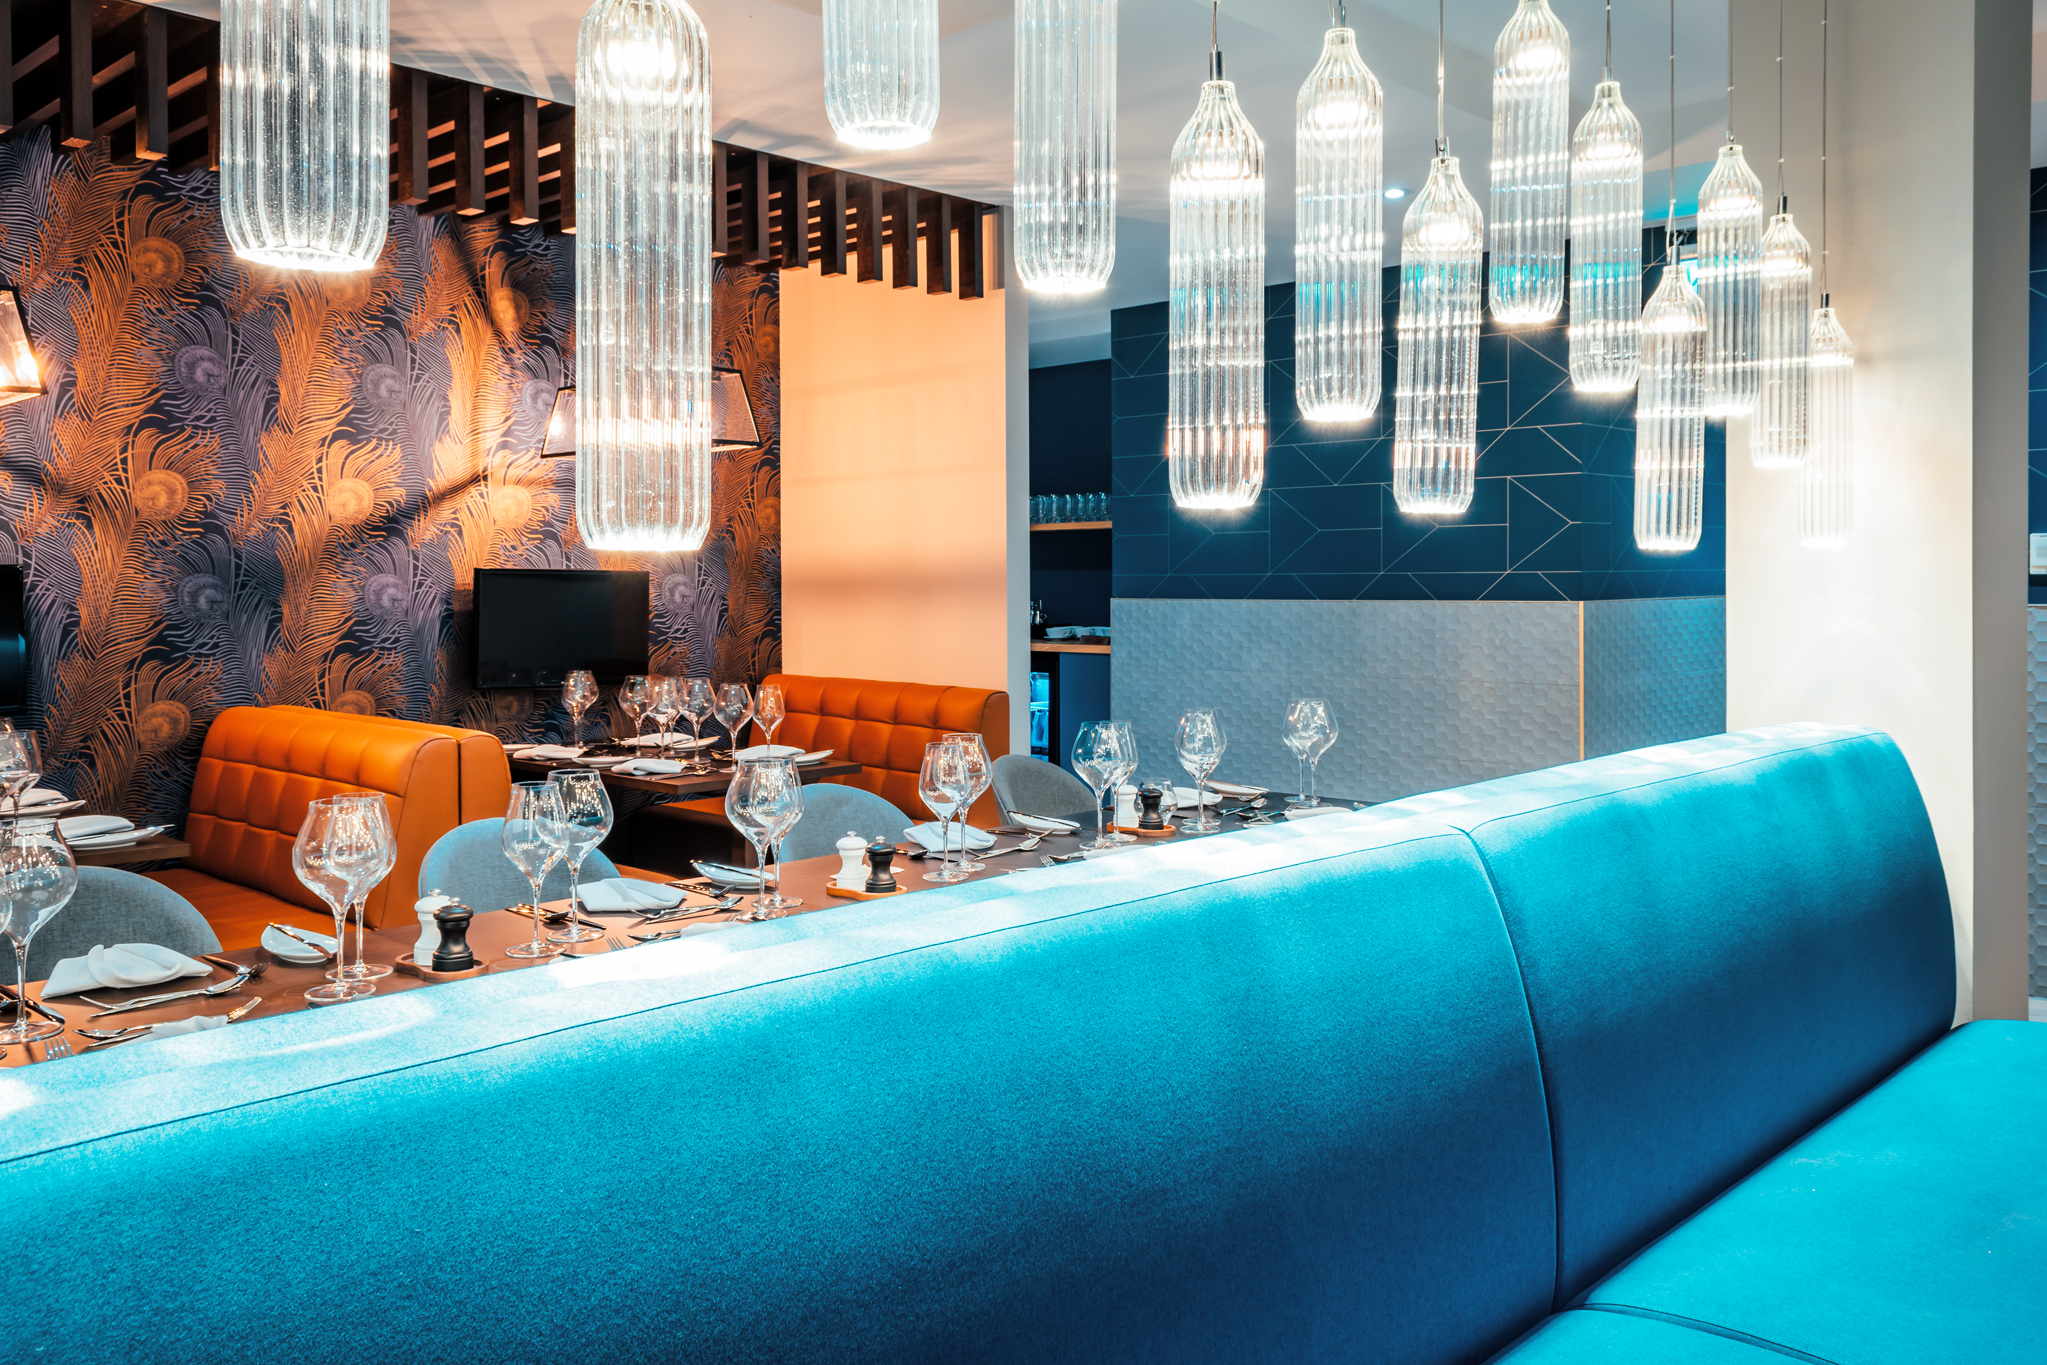 Restaurant Colour Scheme Affects Ambience